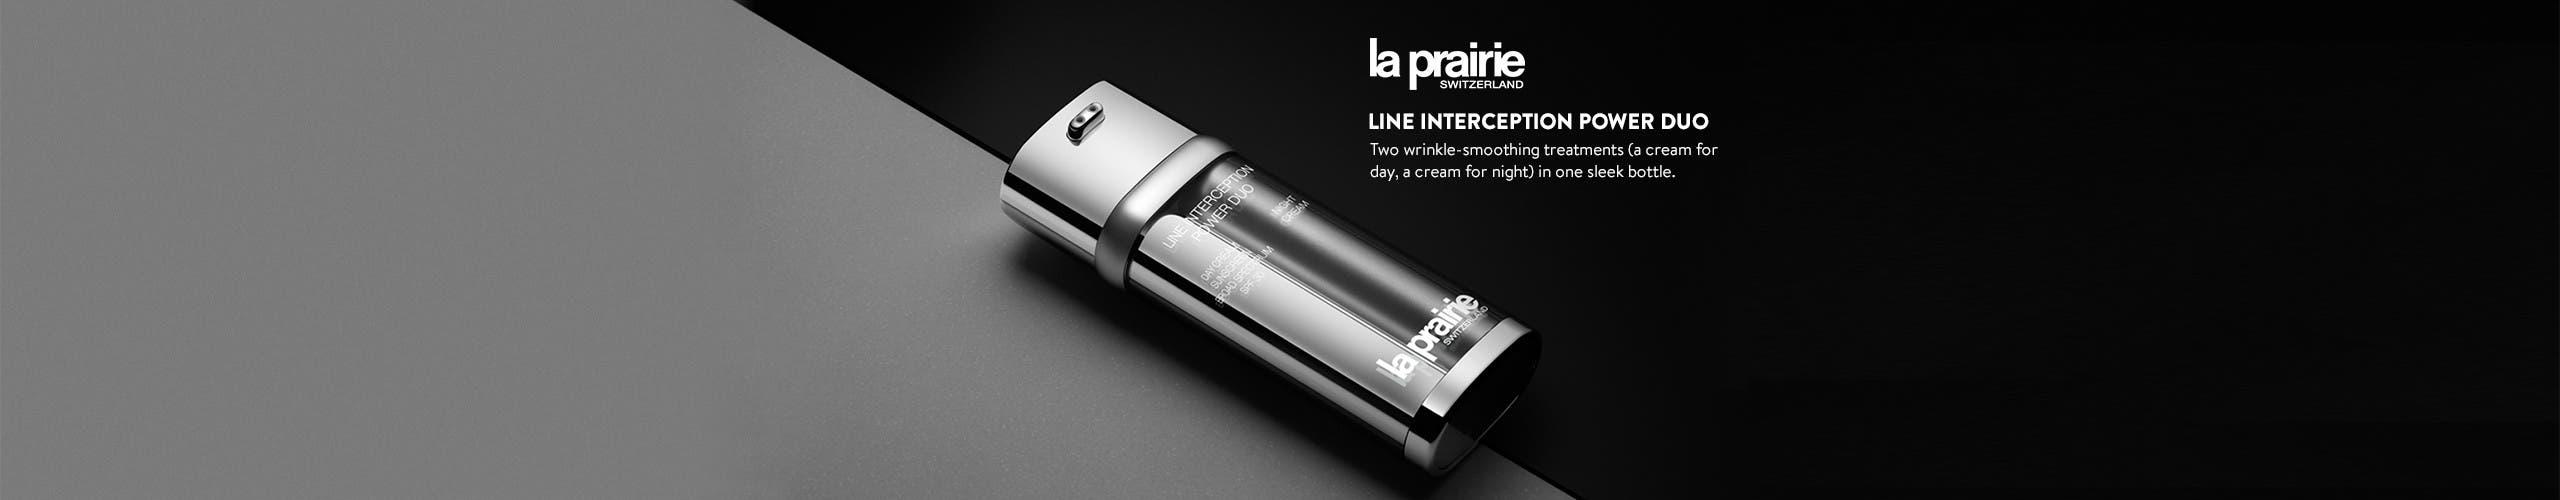 Line Interception Power Duo.